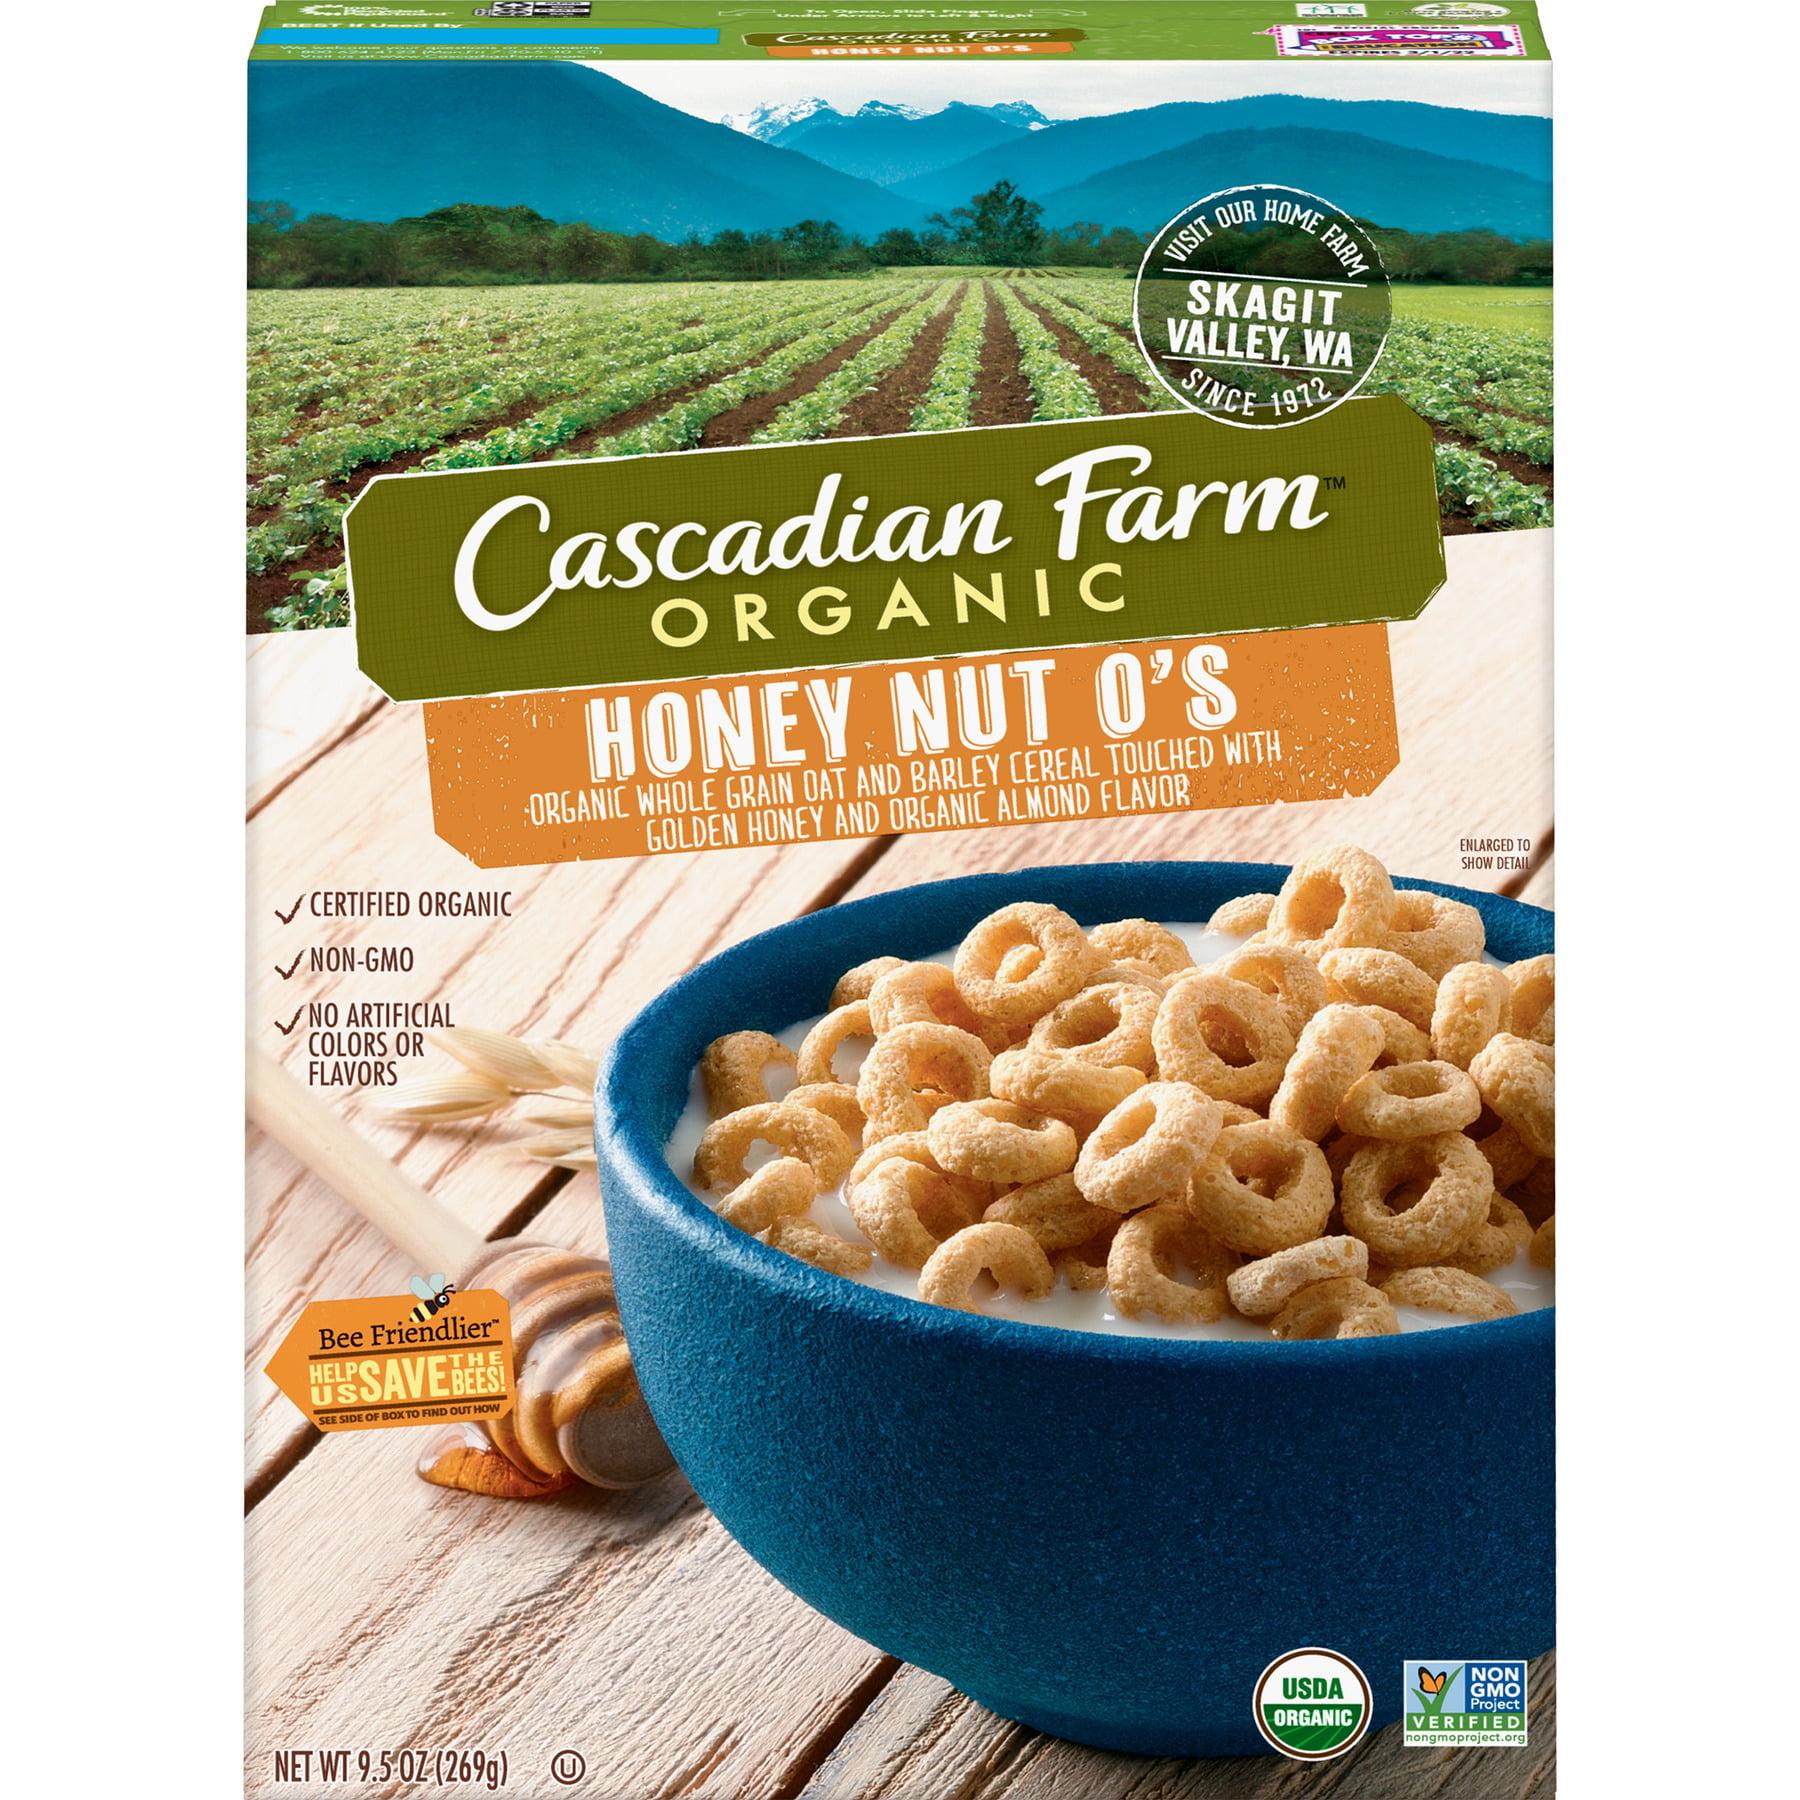 (2 Pack) Cascadian Farm Organic Cereal, Honey Nut O's, 9.5 oz